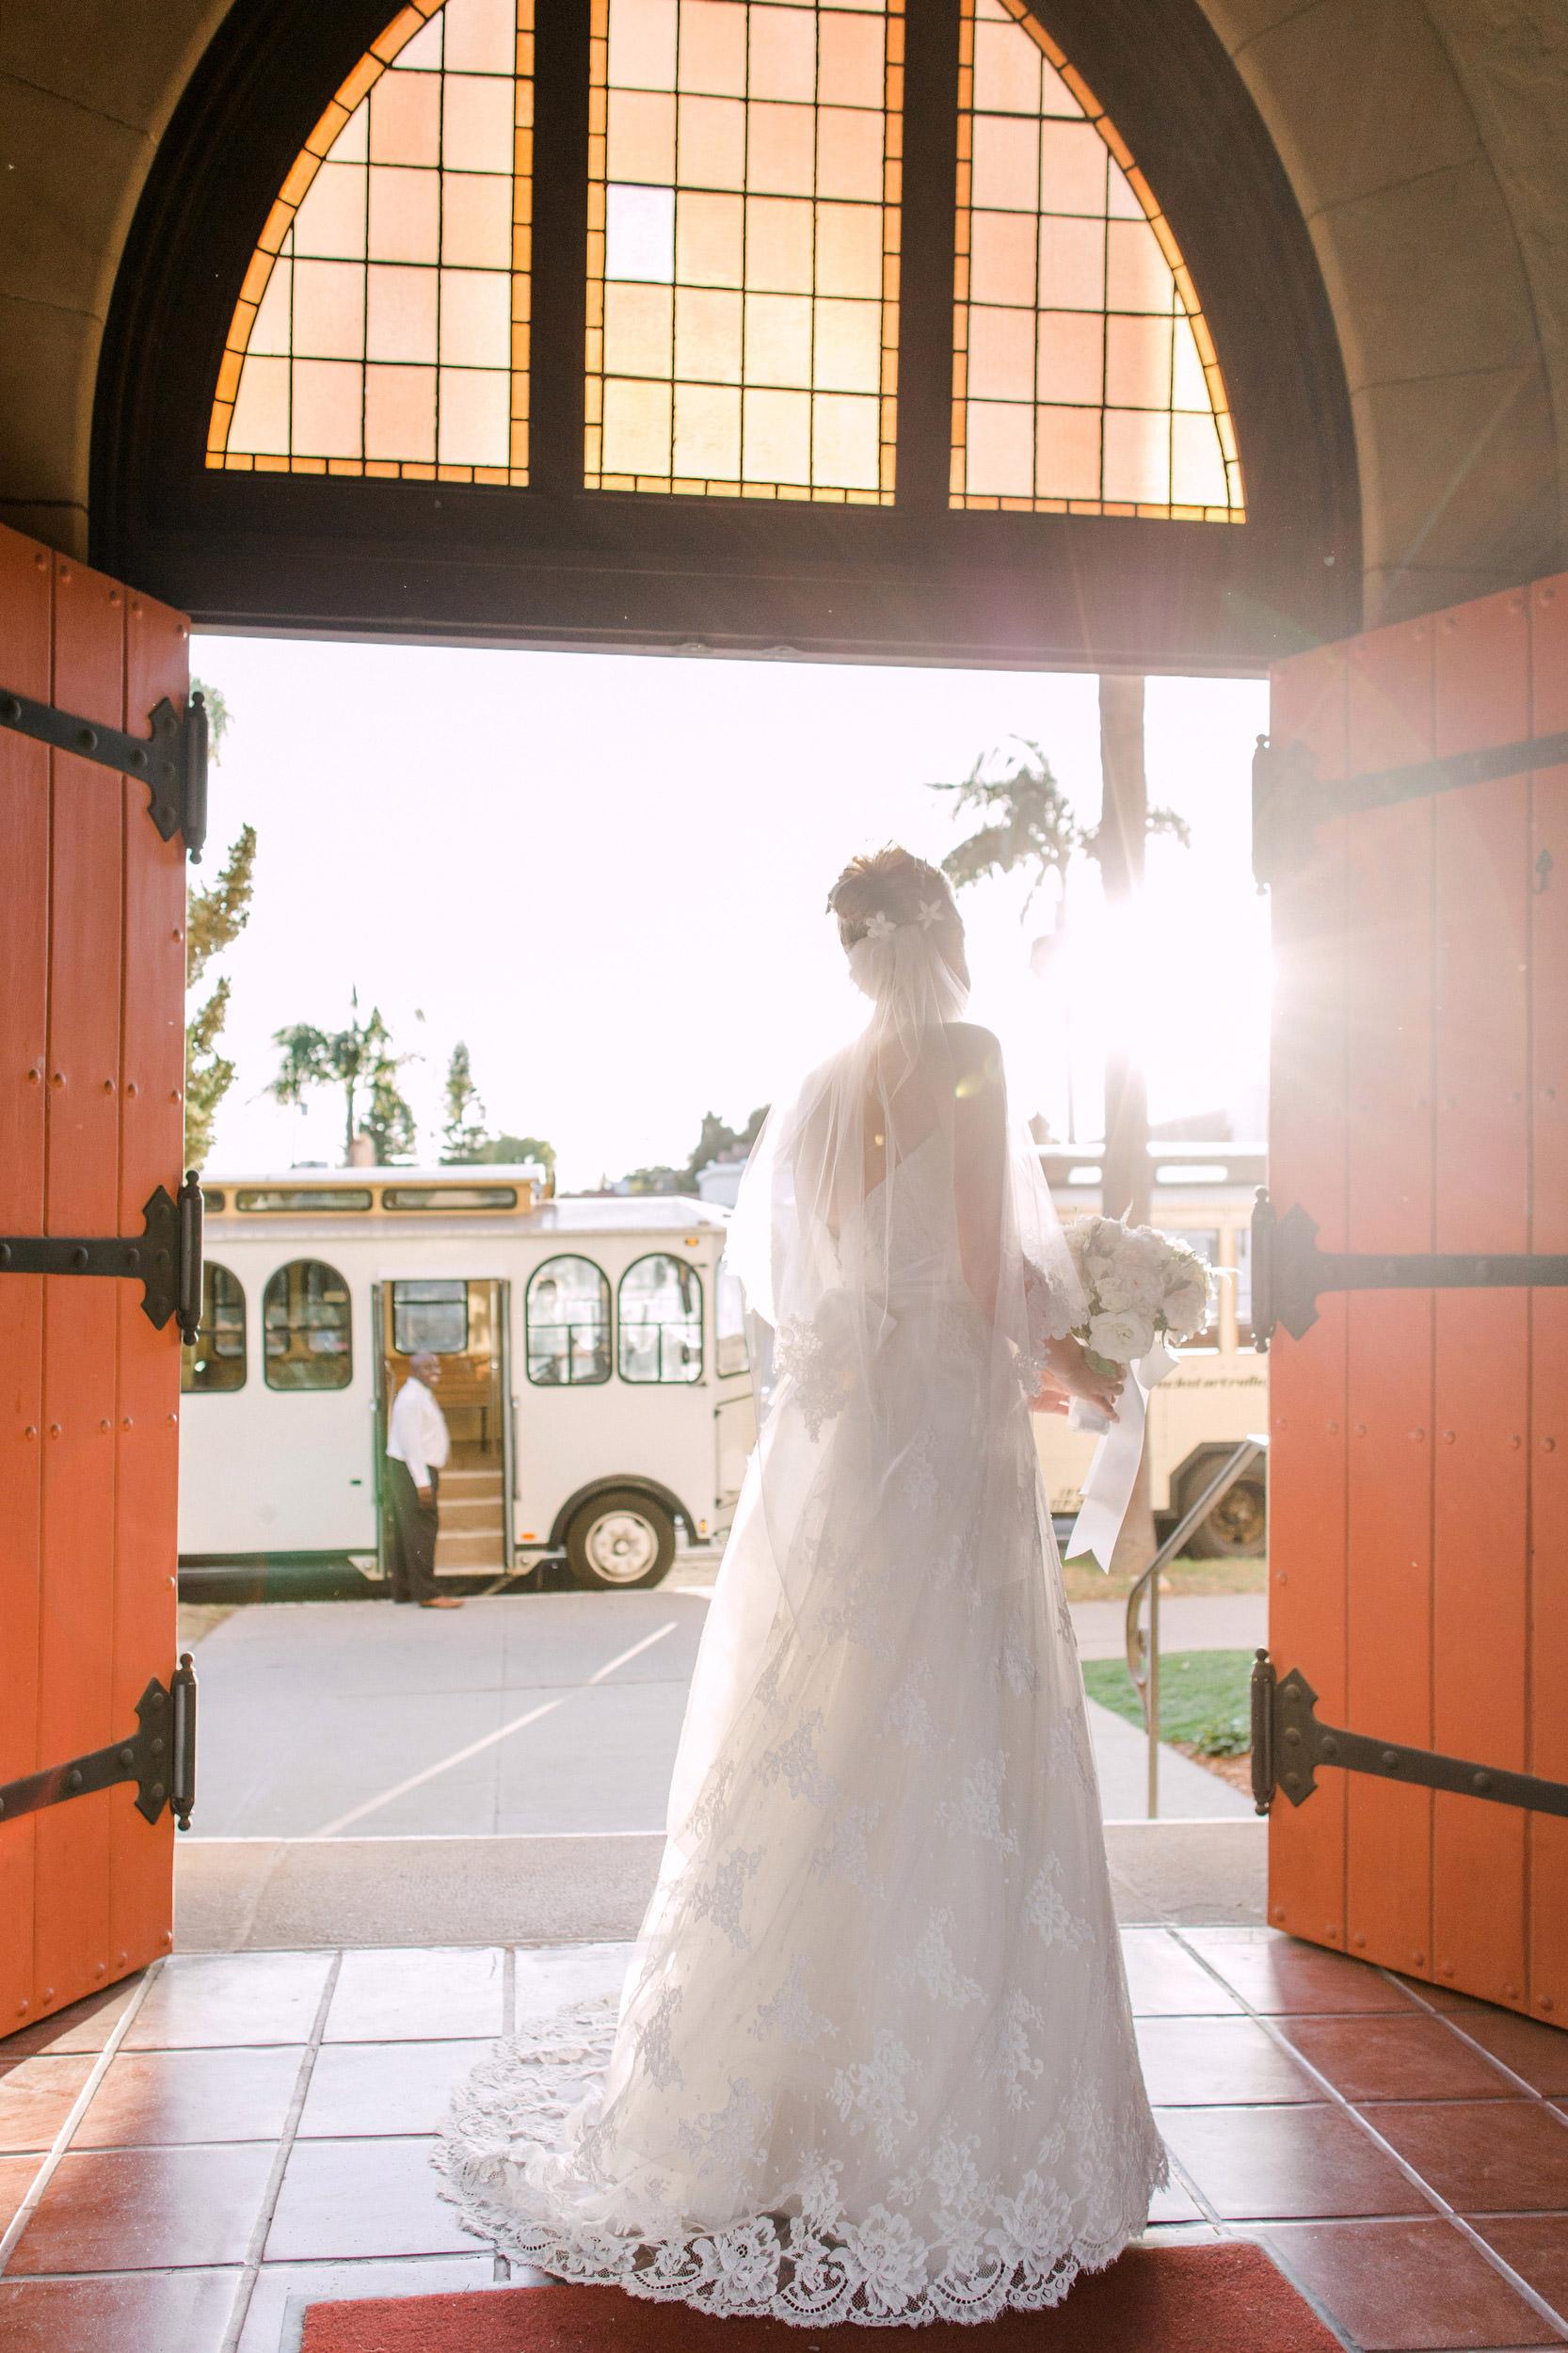 biltmore_santa_barbara_wedding_photos_coral_casino_018.jpg